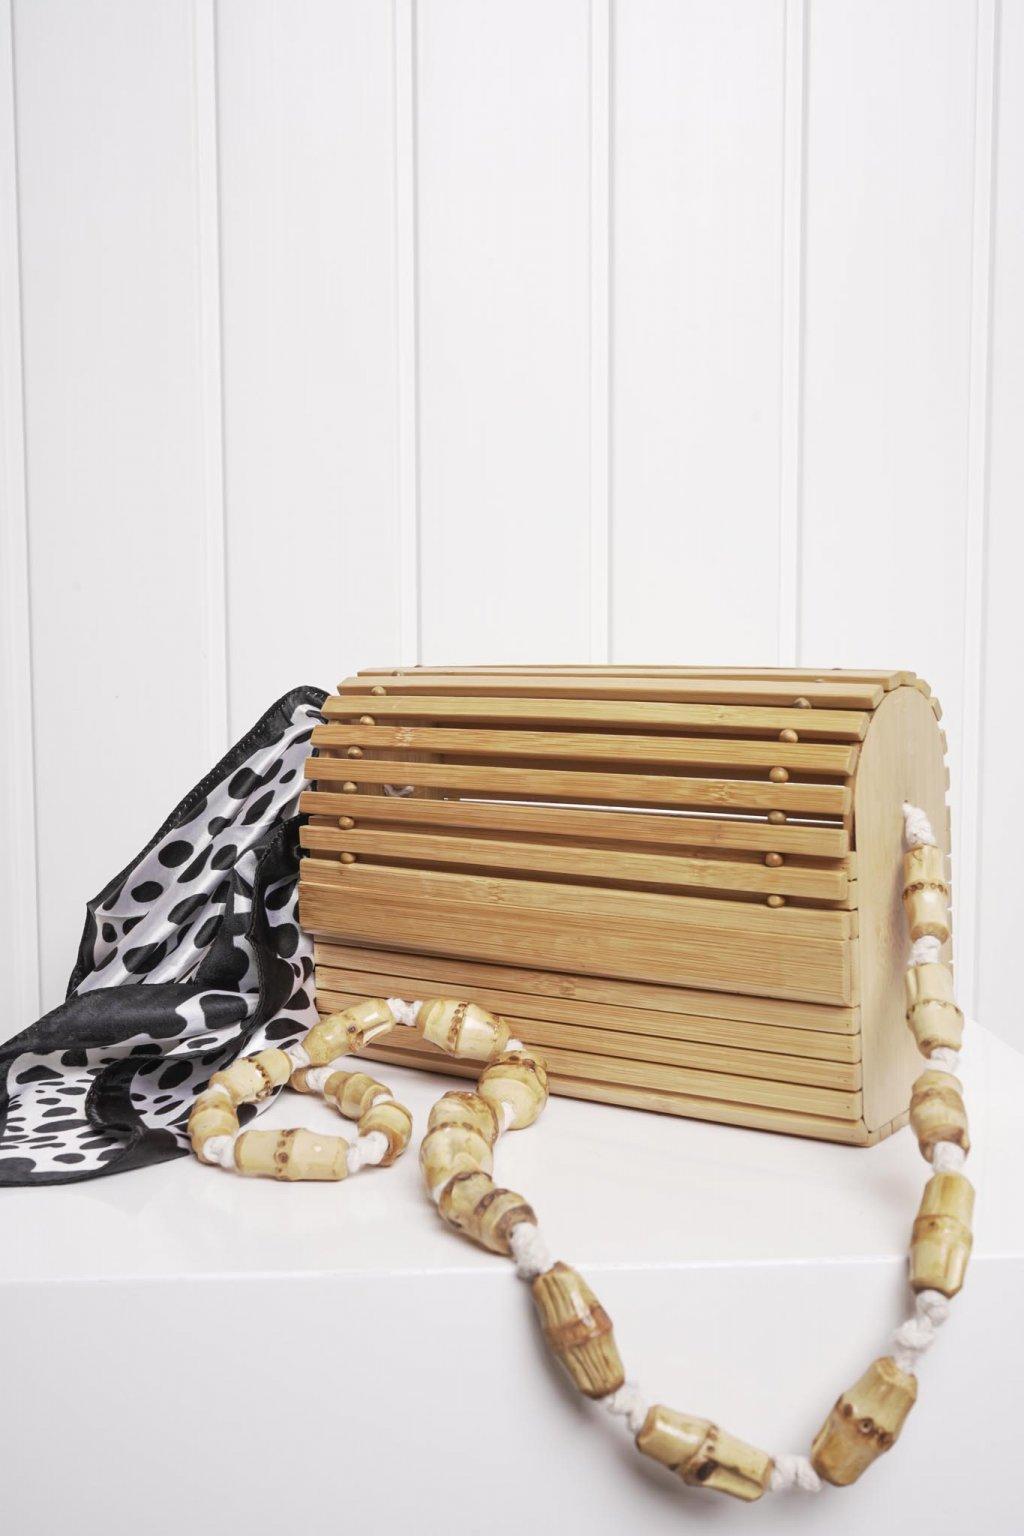 Kabelka, ruksak, dobrá cena, čierna kabelka, čierny ruksak, basic, kabelky, ruksaky 24